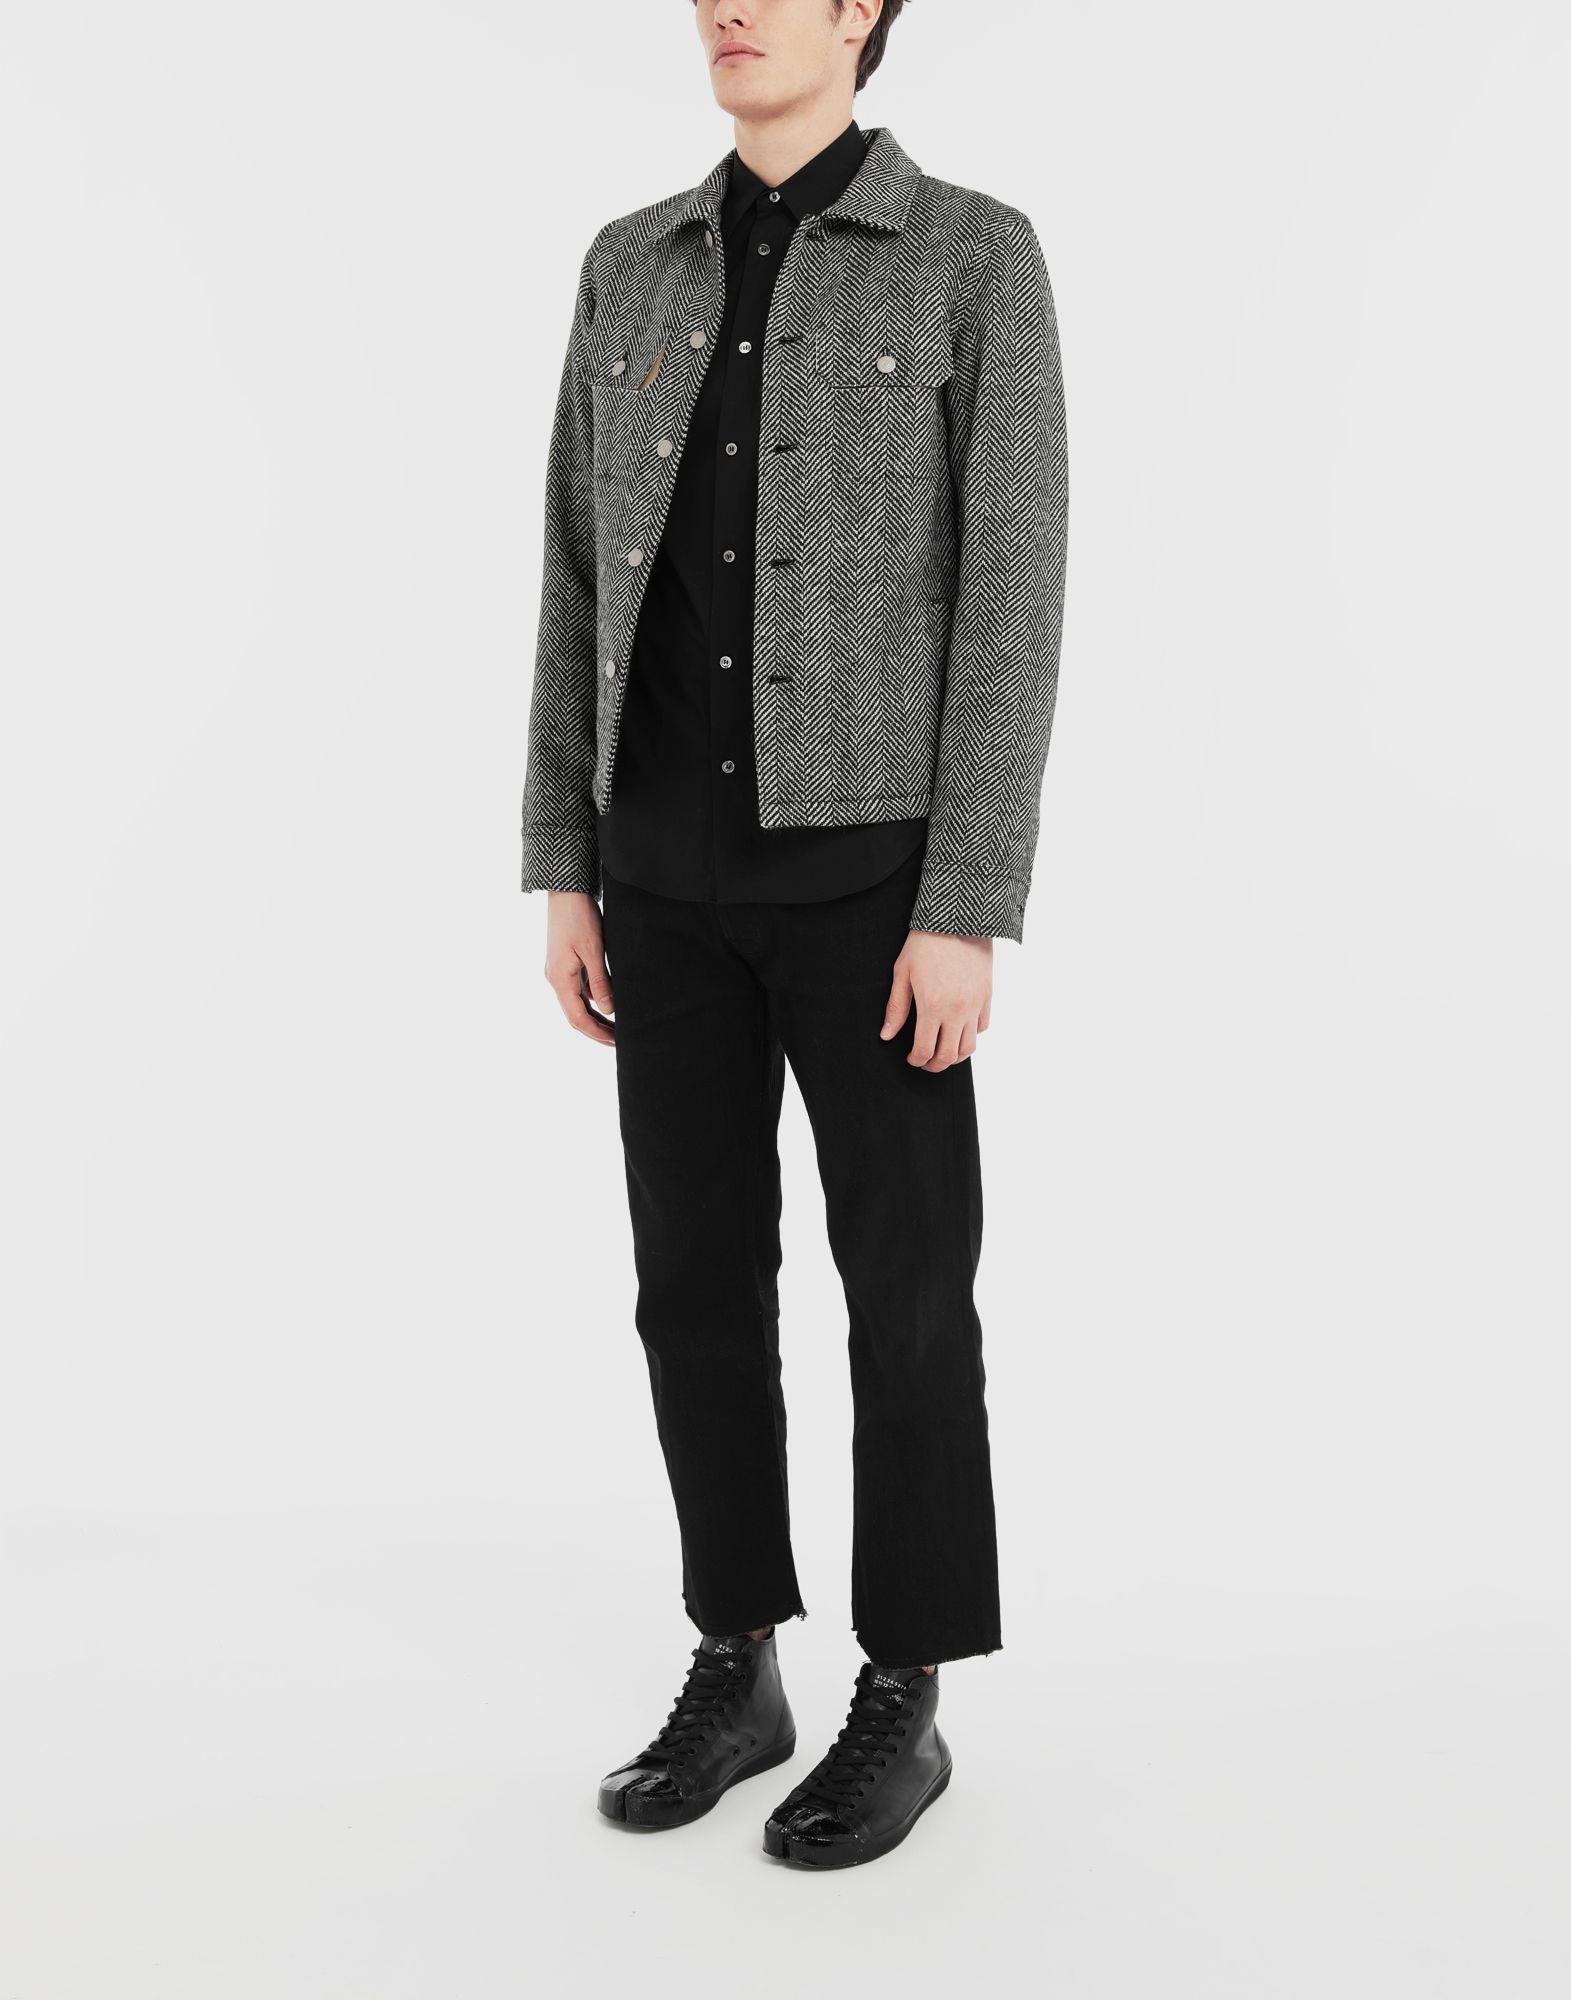 MAISON MARGIELA Décortiqué herringbone jacket Jacket Man d